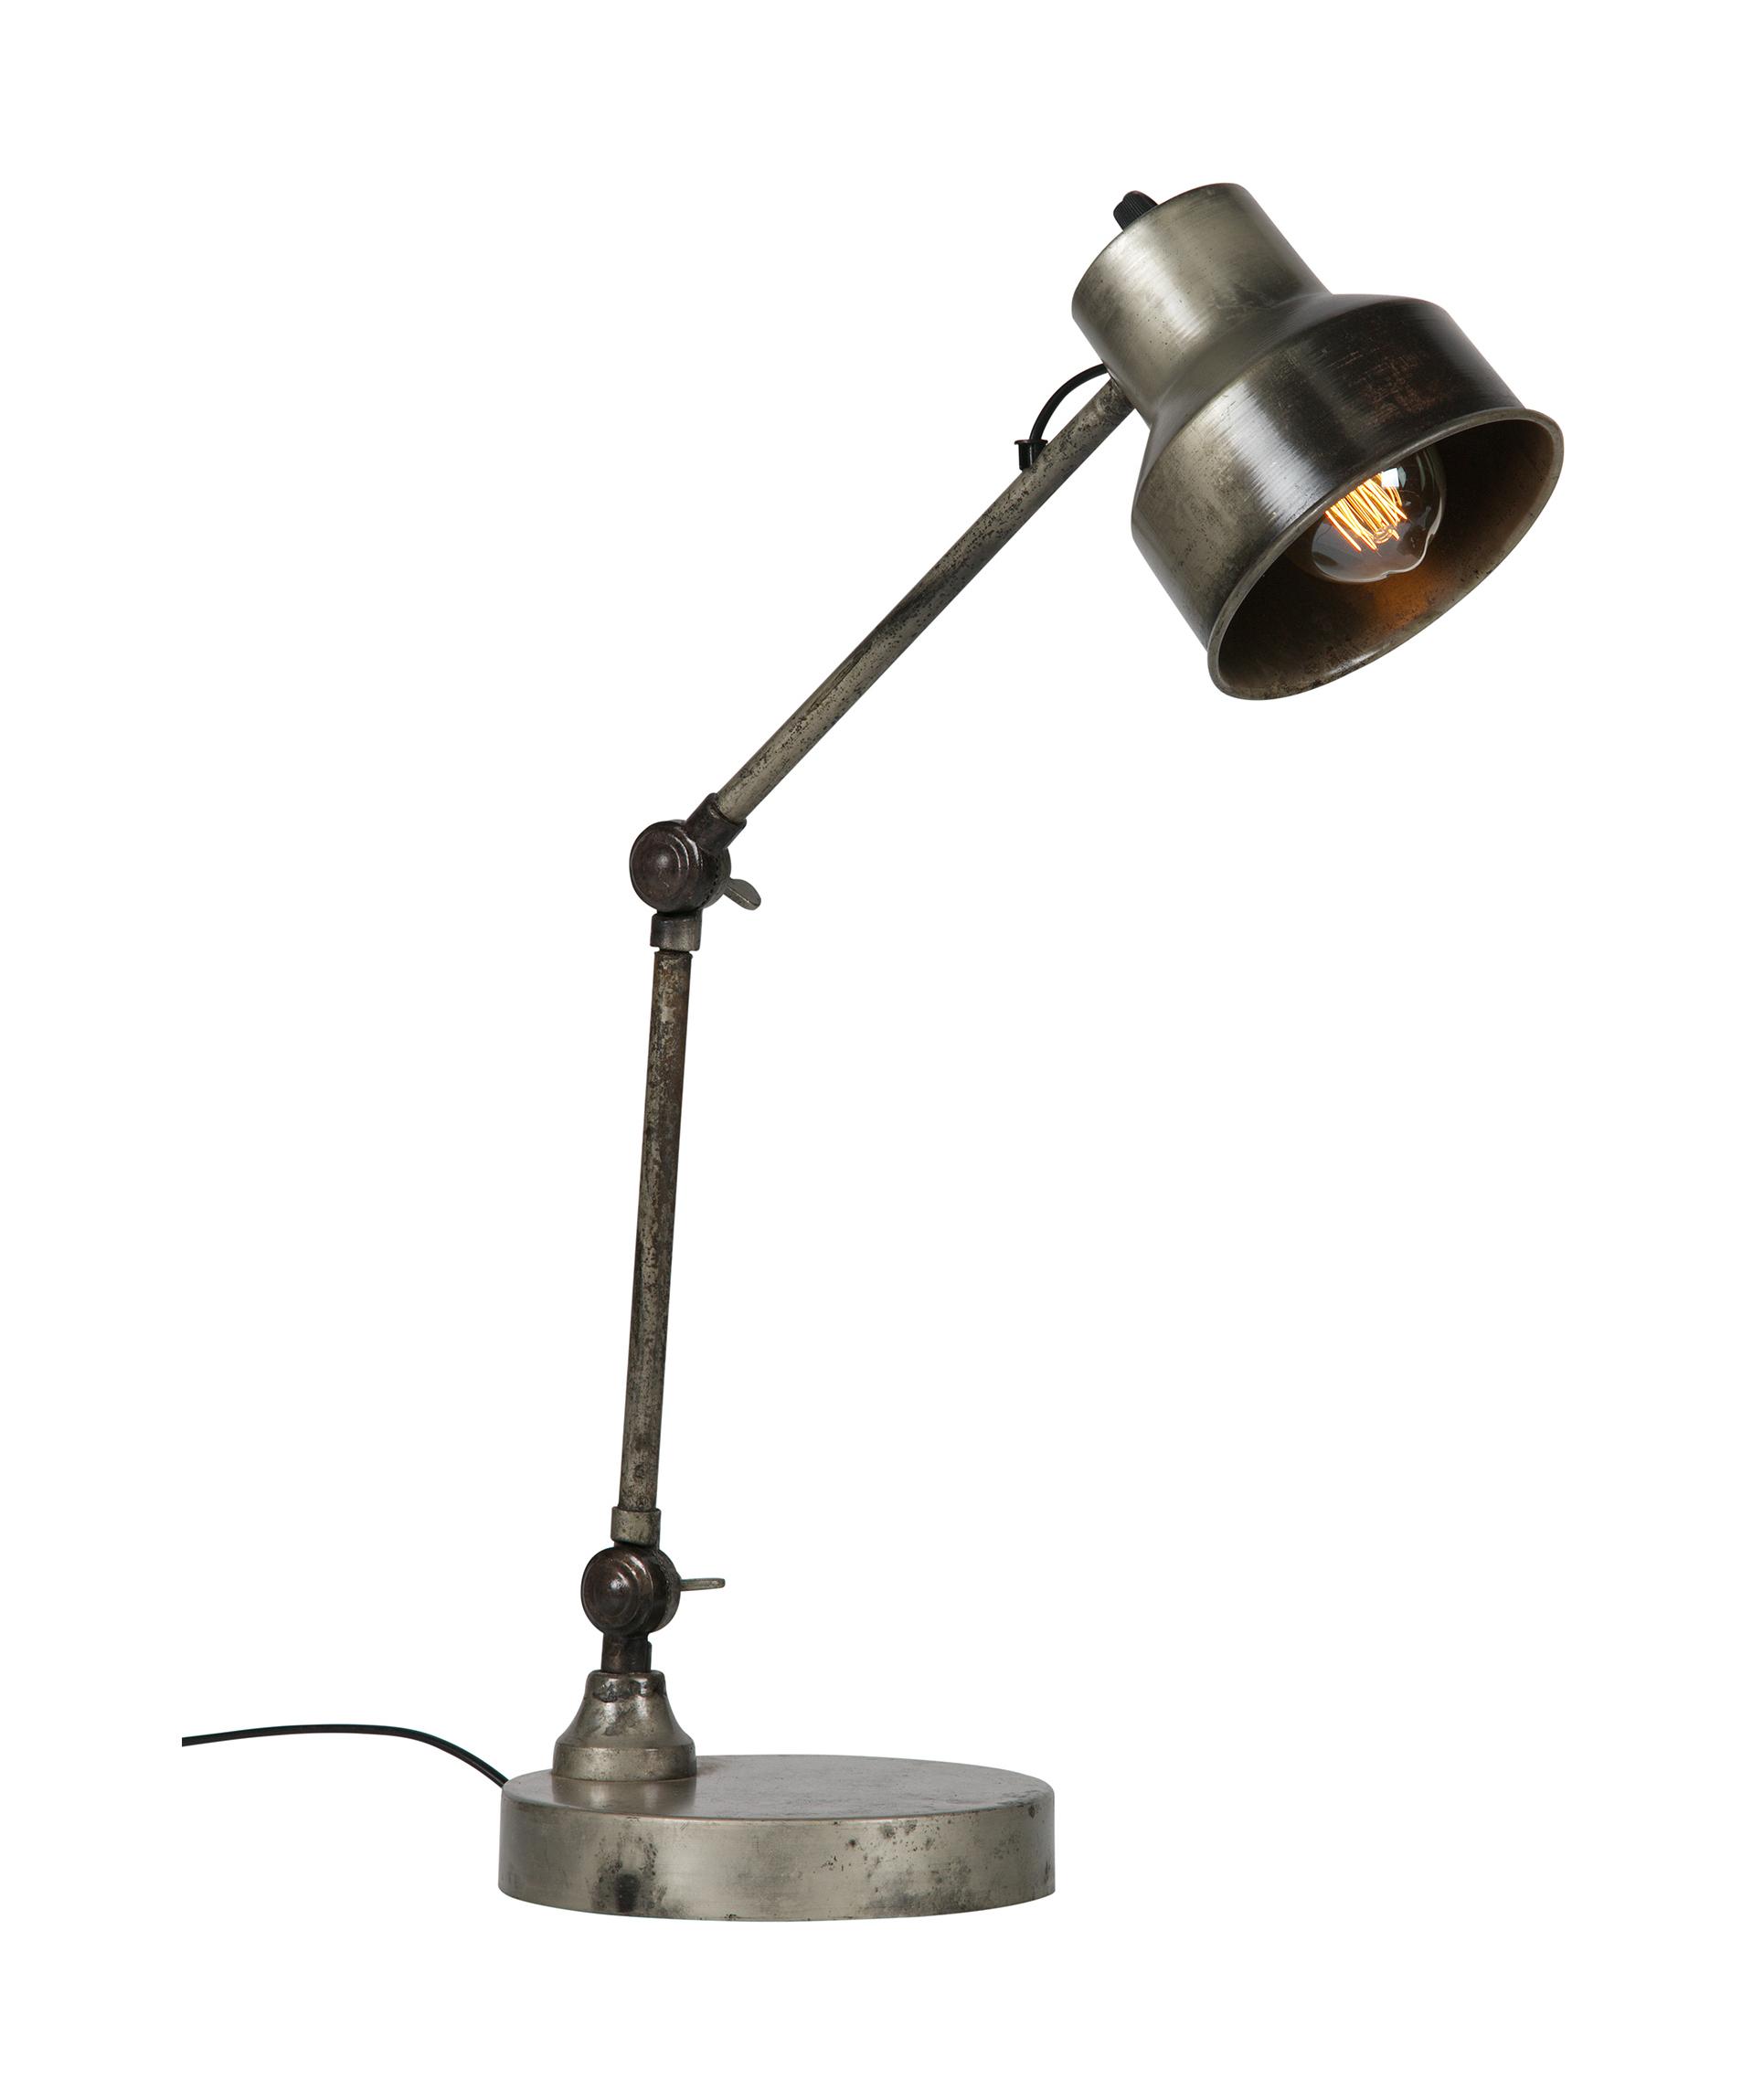 WOOOD Tafellamp 'Hector', kleur antiek zilver korting